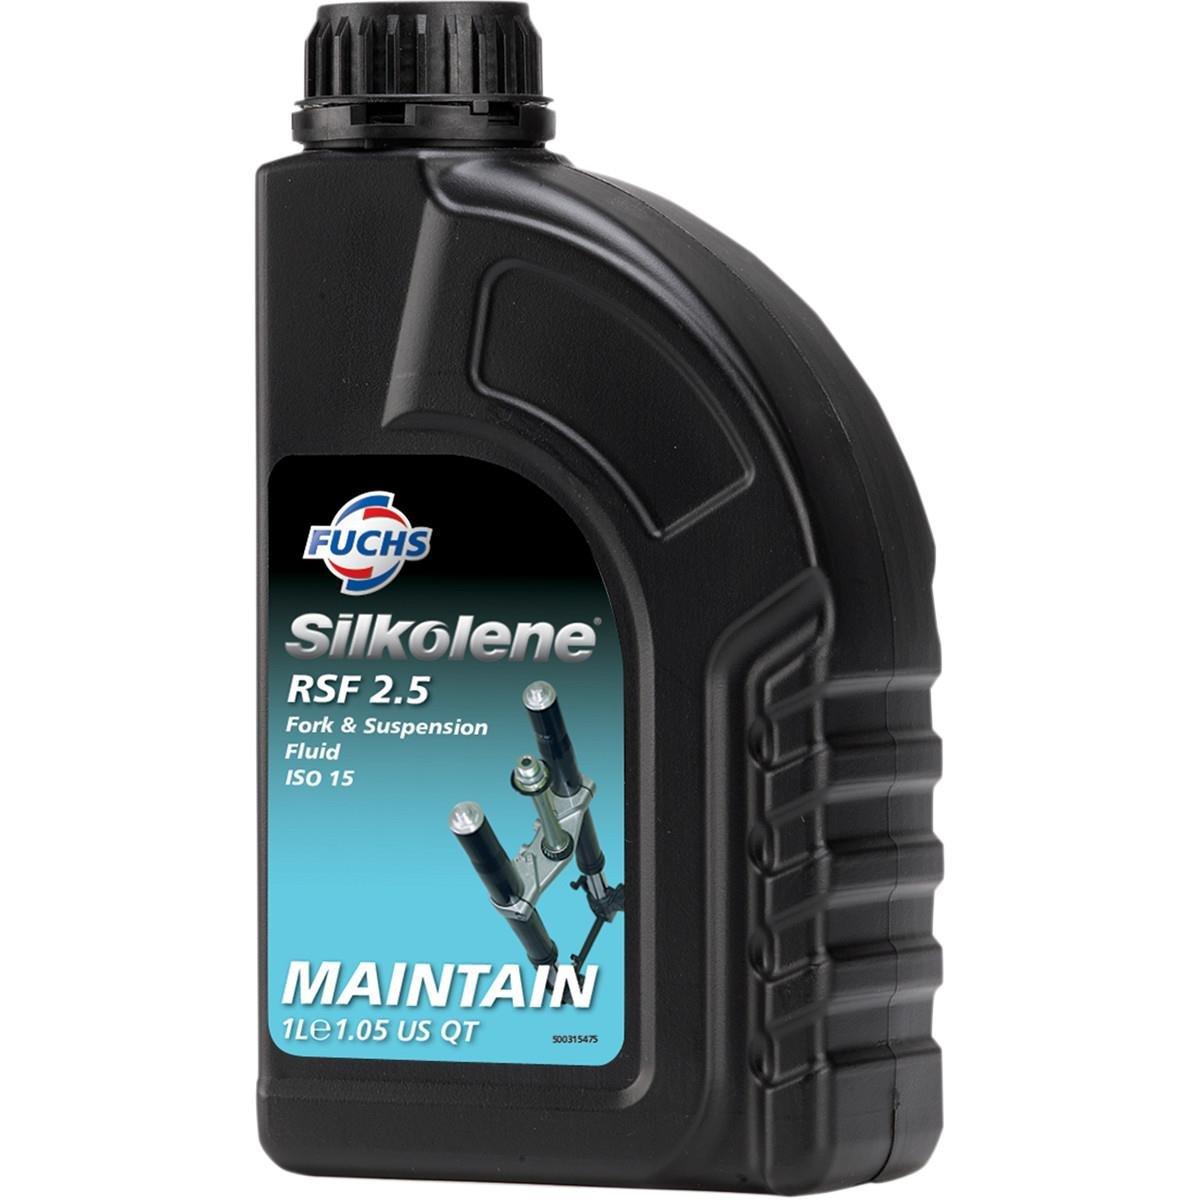 Silkolene 600967697 Pro RSF Fork Oil - 2.5wt. - 1L.